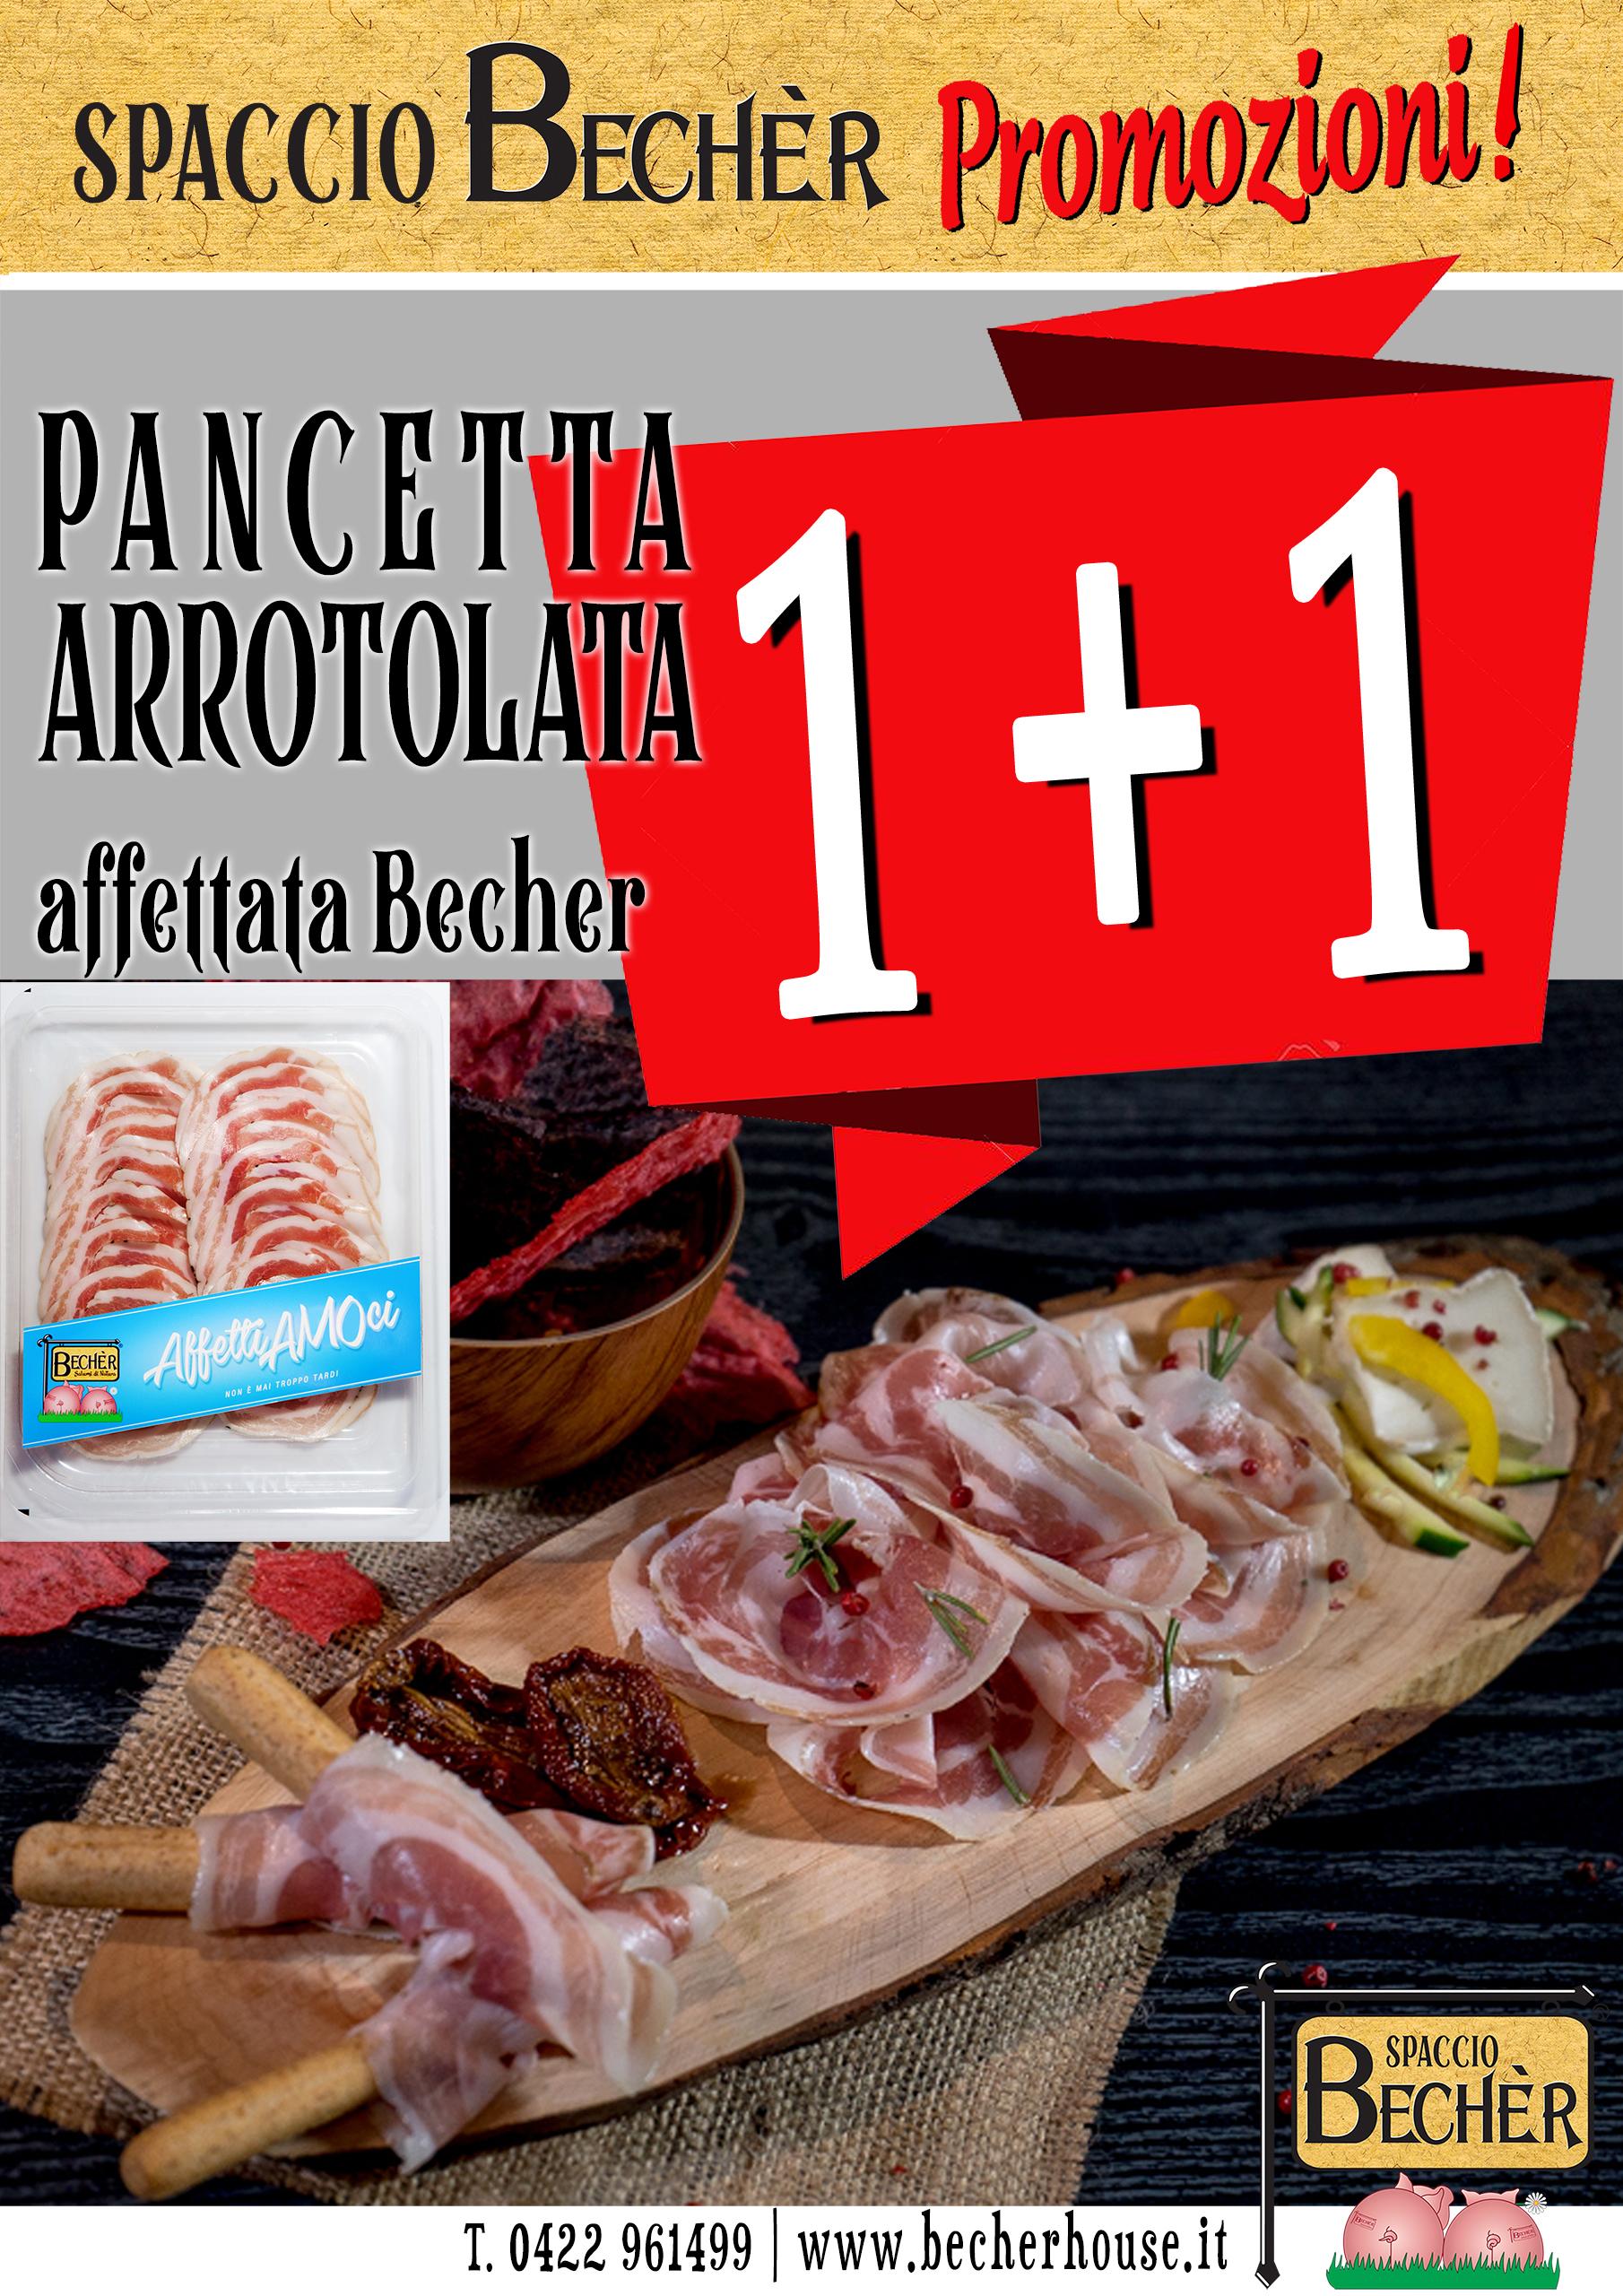 Flyer promo pancetta arrotolata affettata sito